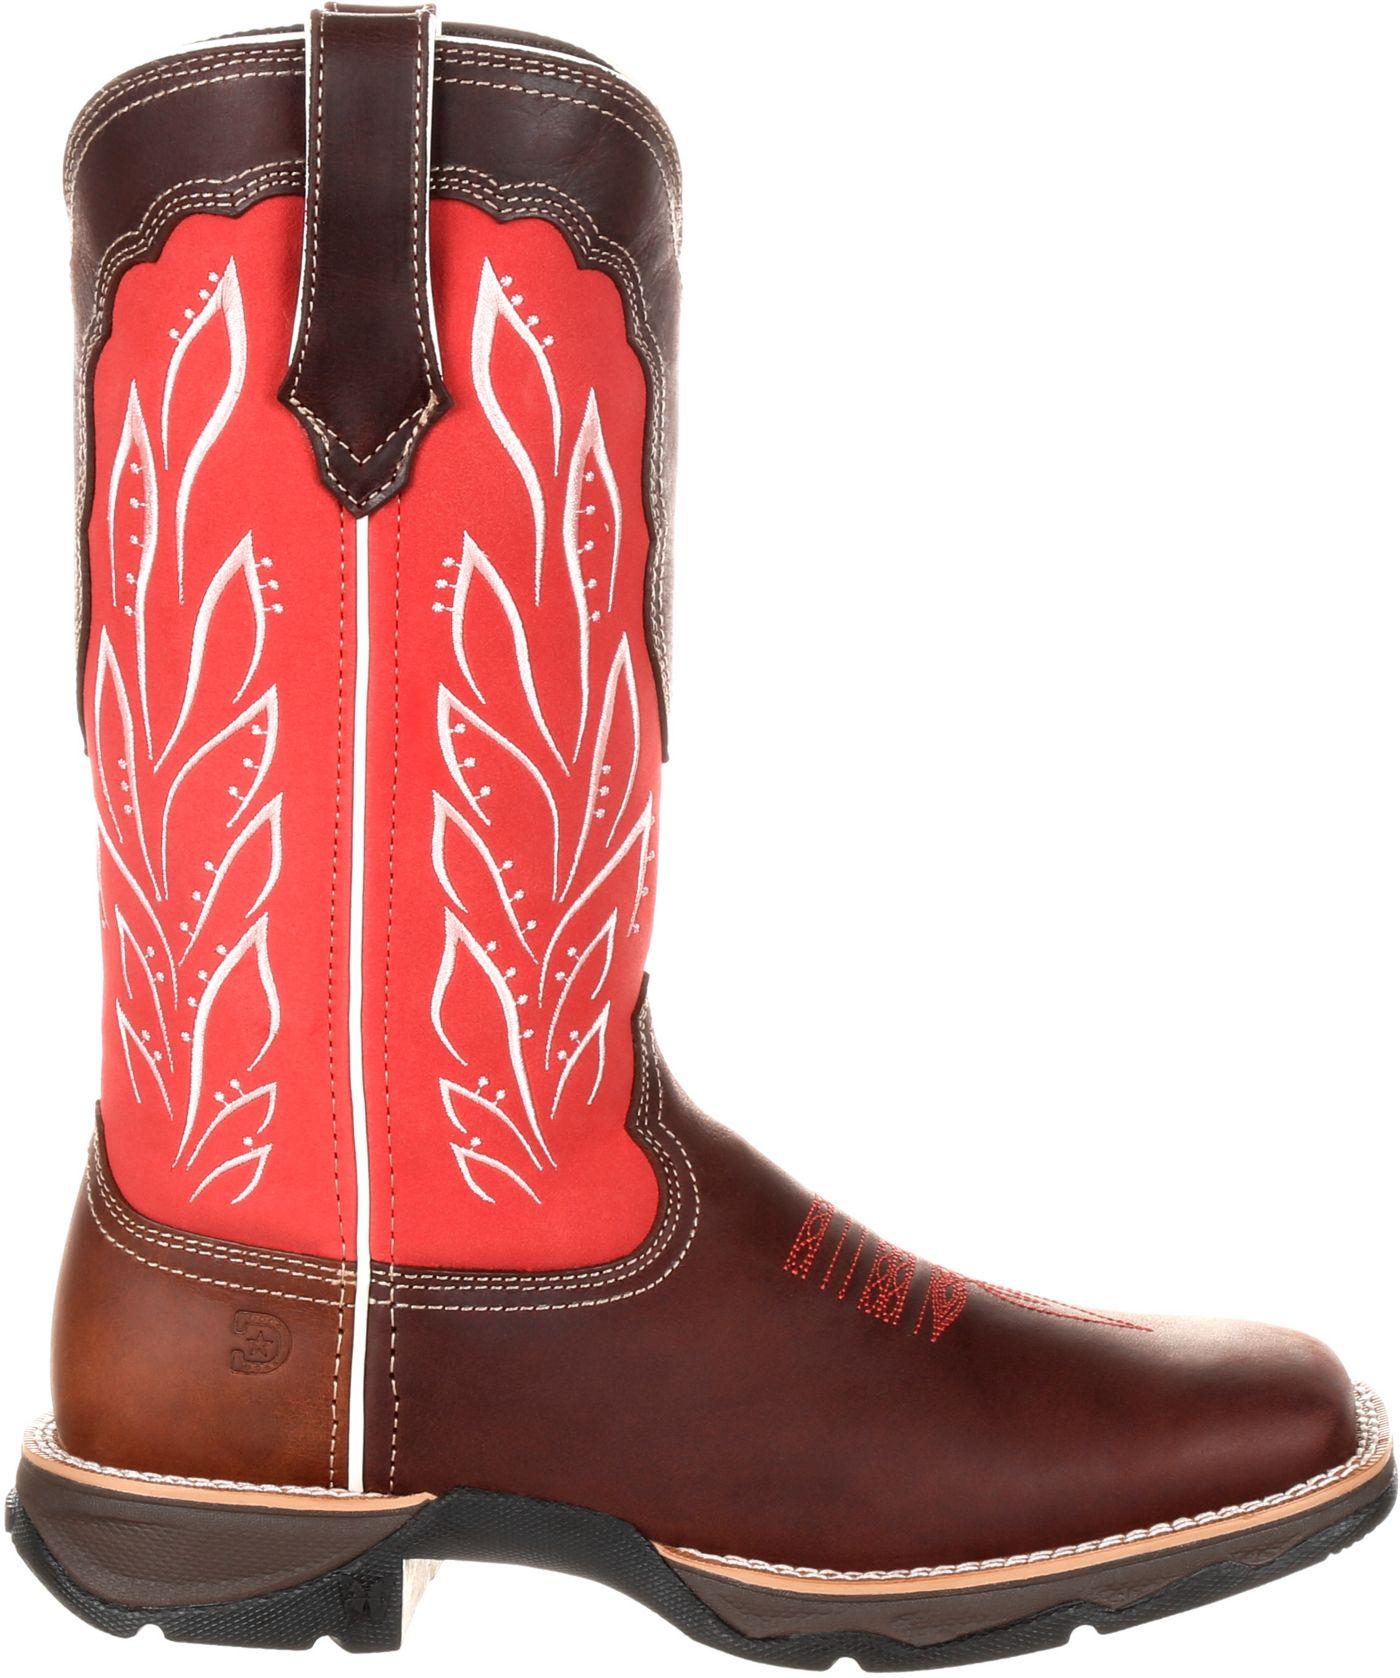 Durango Women's Lady Rebel Strawberry Sunrise Western Work Boots